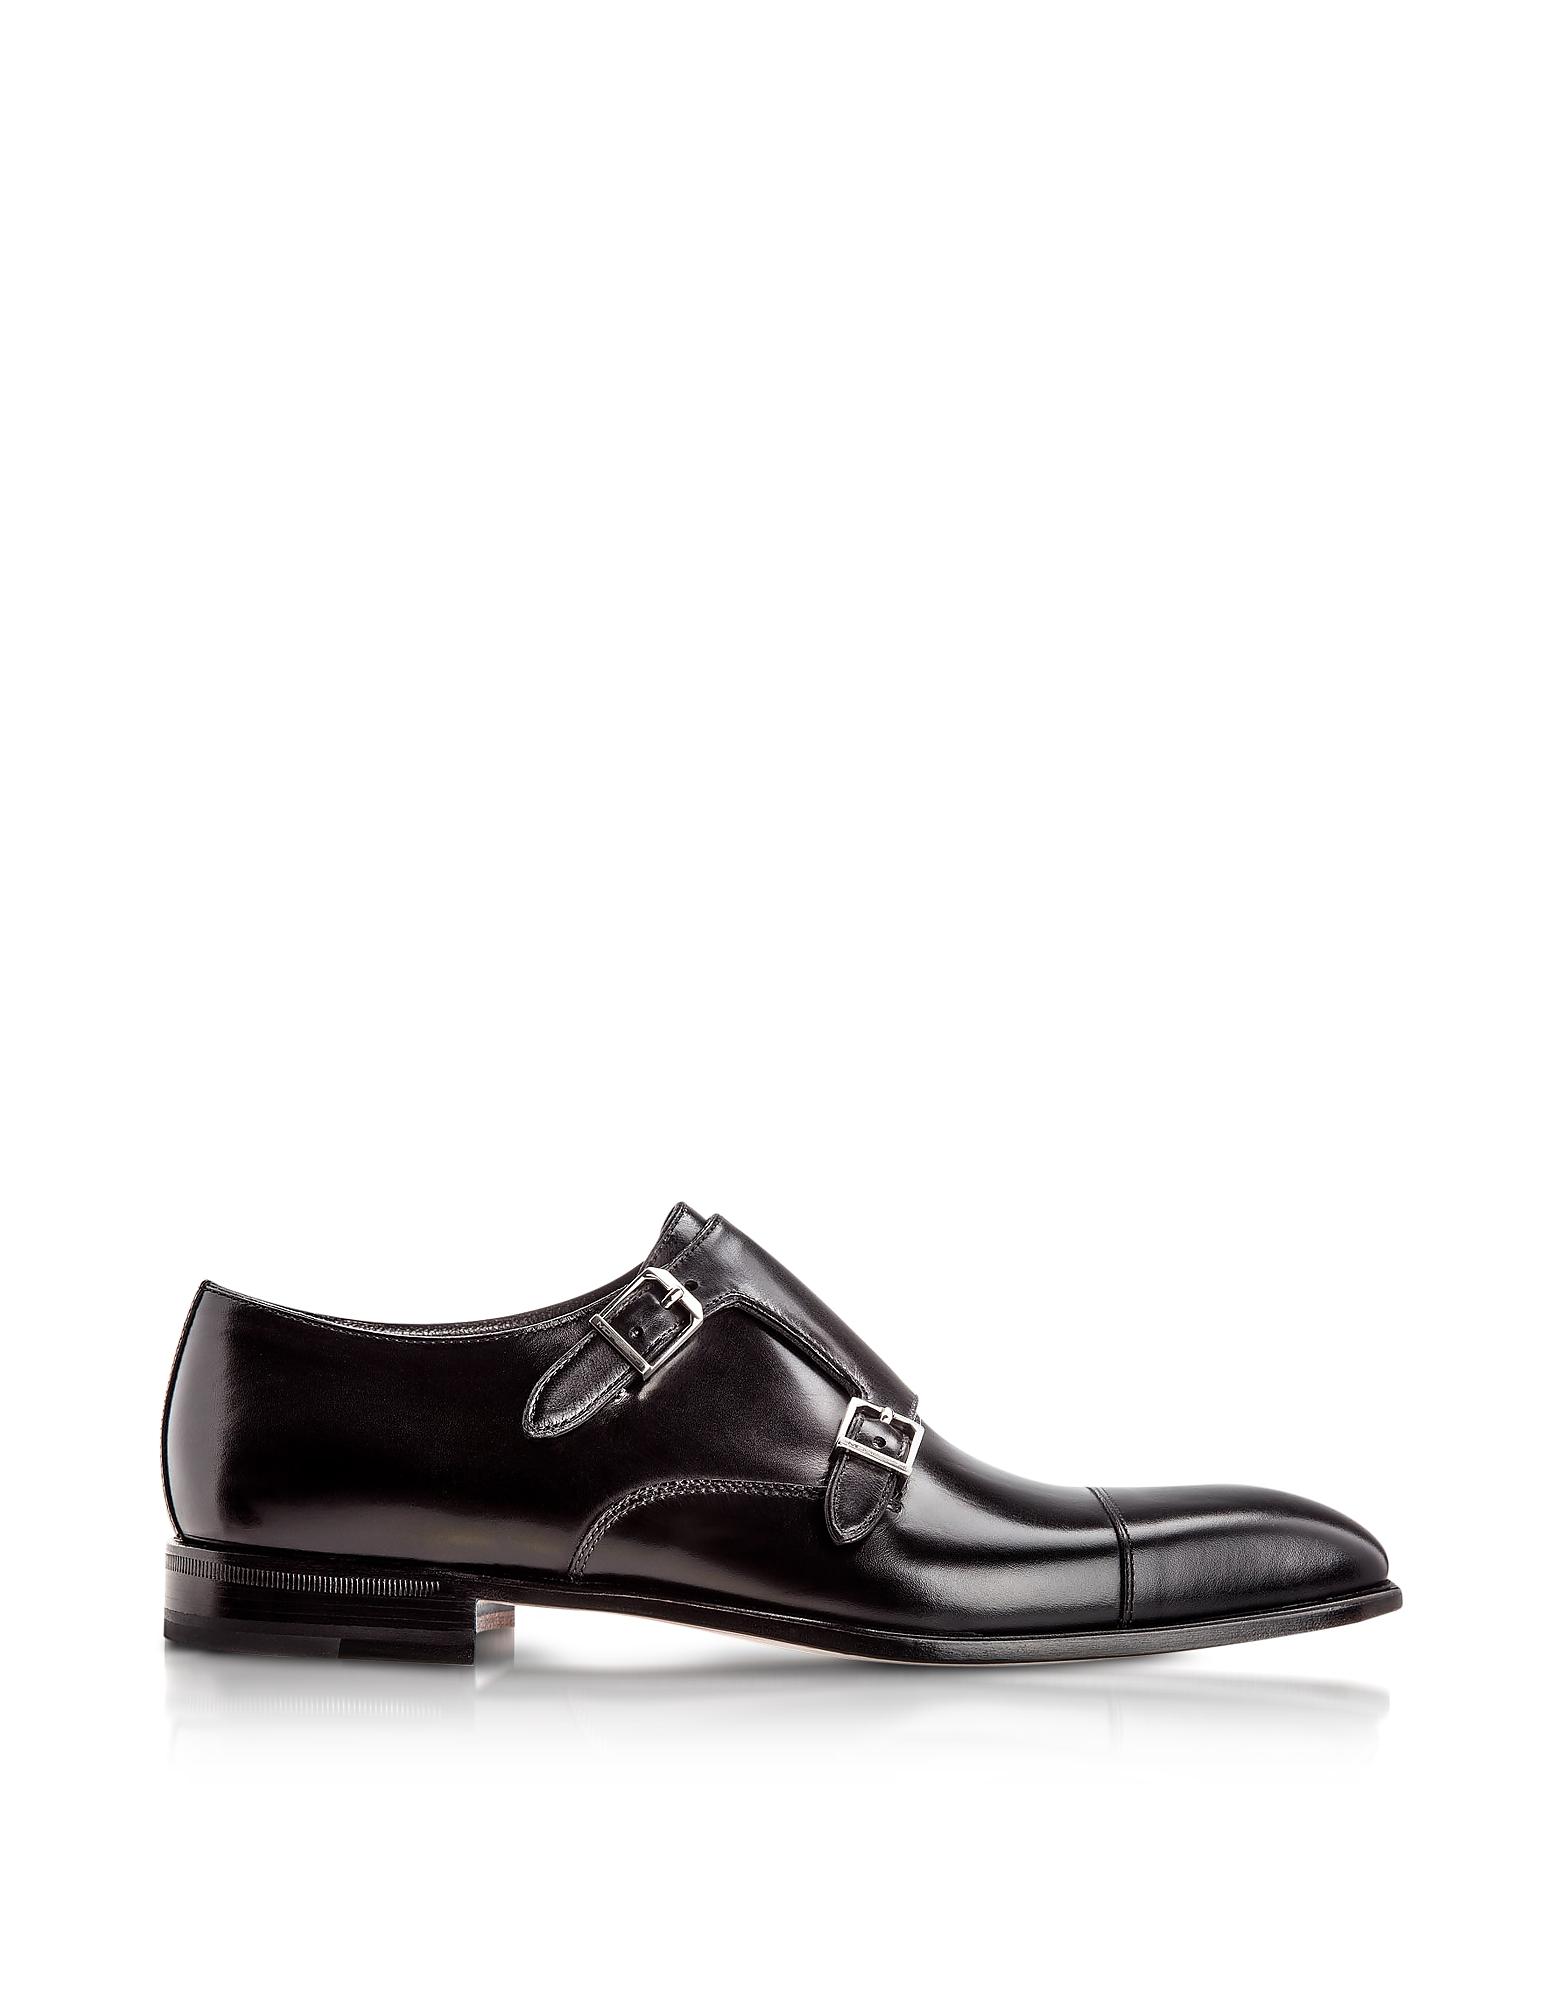 Moreschi Shoes, Toronto Black Calfskin Monk Shoes